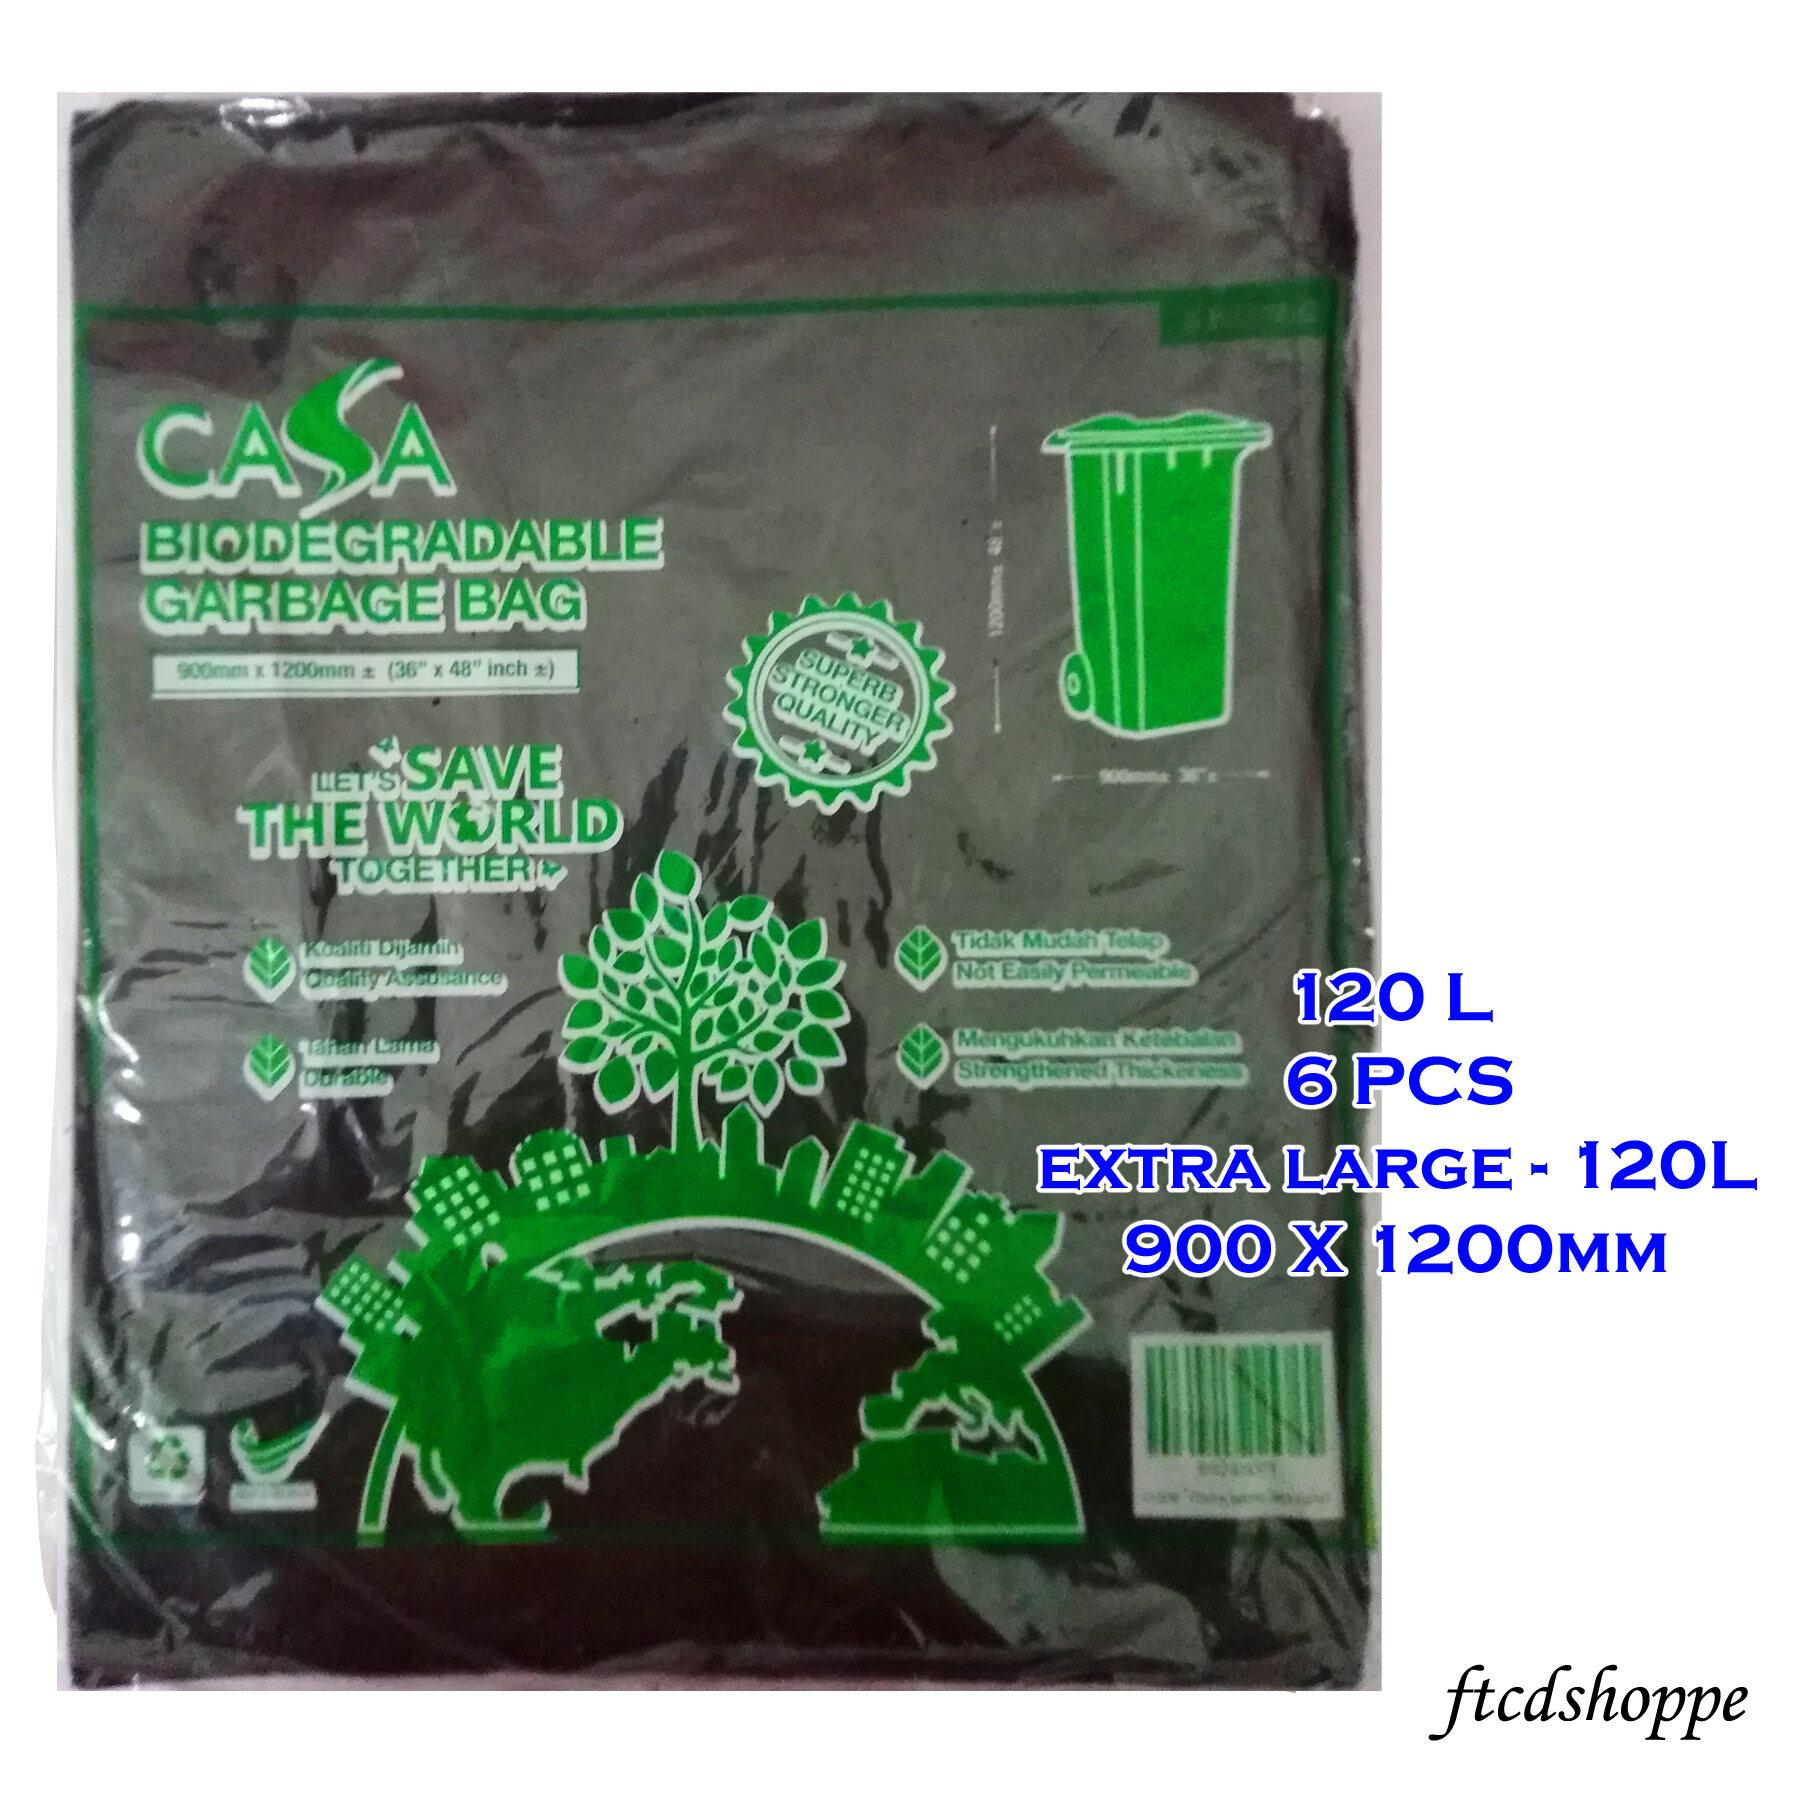 CASA Beg Plastik Sampah / Garbage bag Extra Large 120L (6 Pcs) 900 x 1200 mm - Oxo Biodegradable